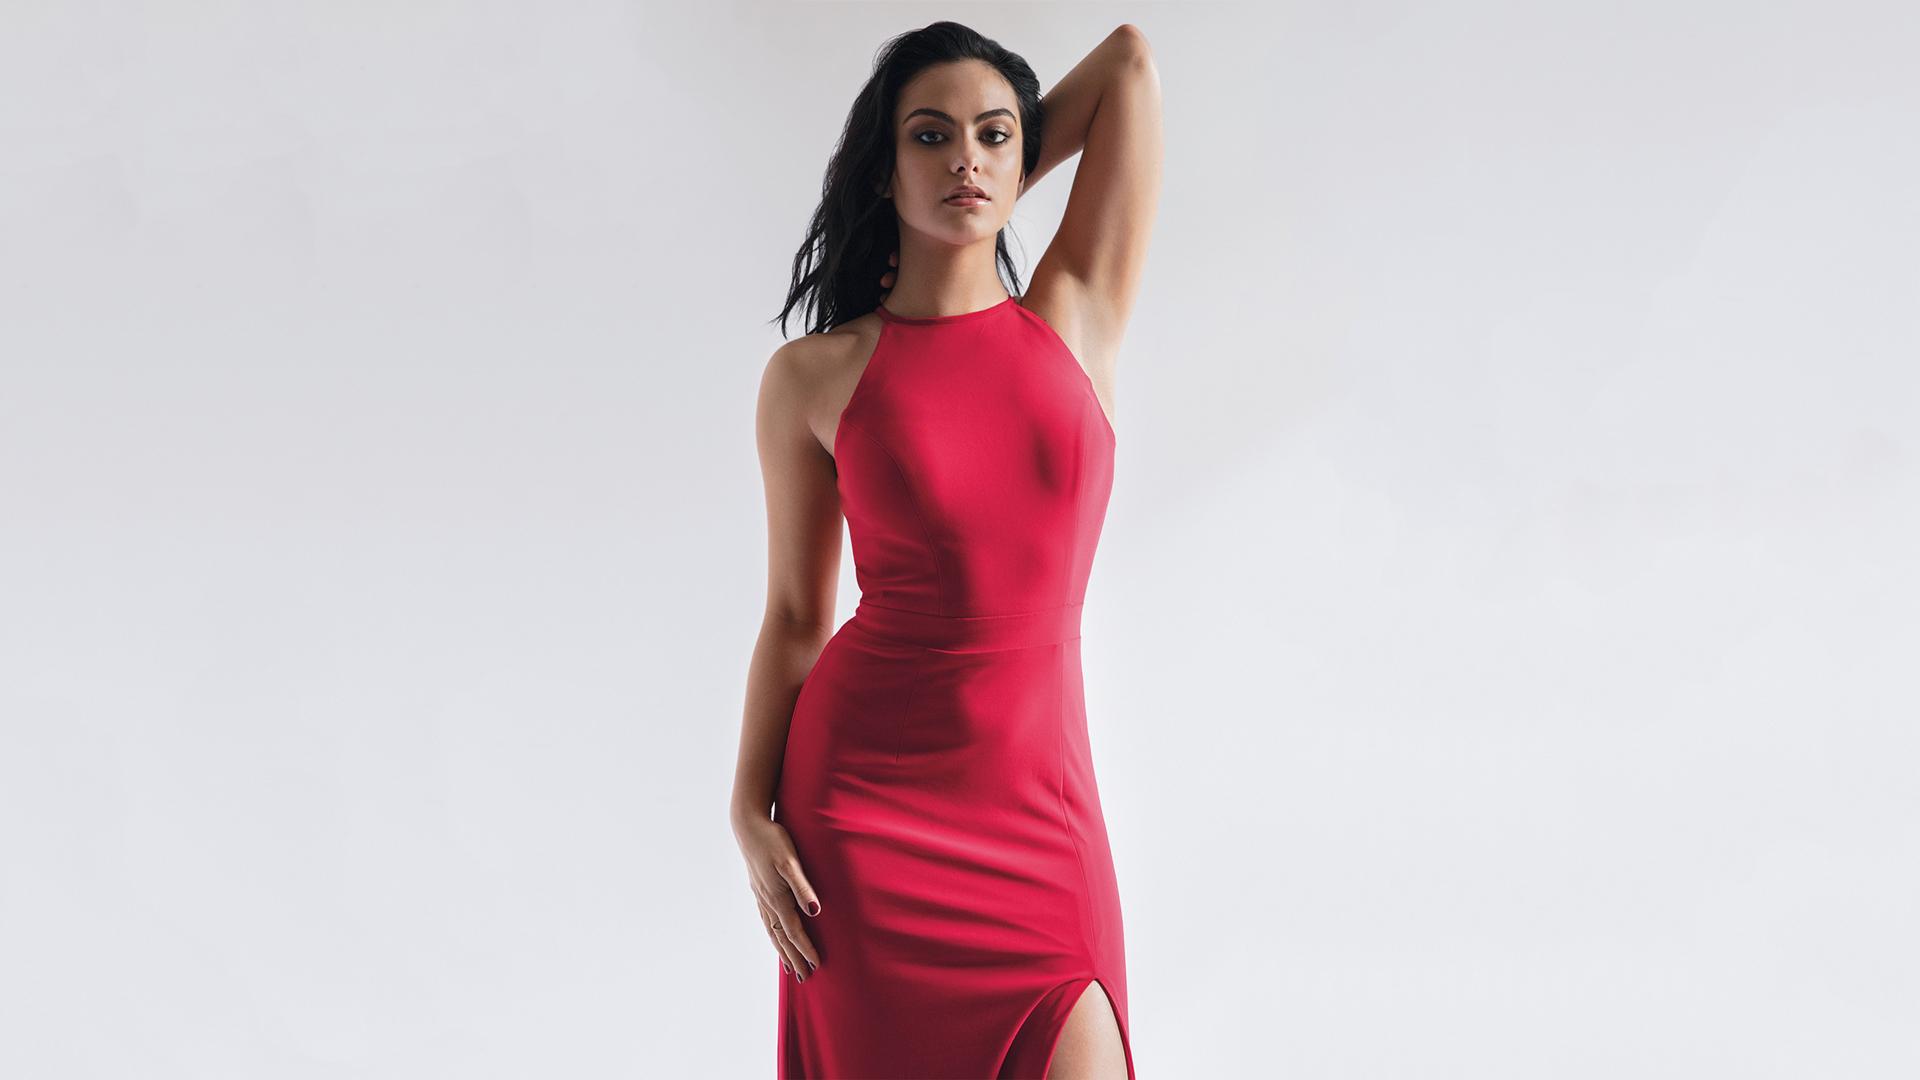 camila mendes red dress wallpaper 63323